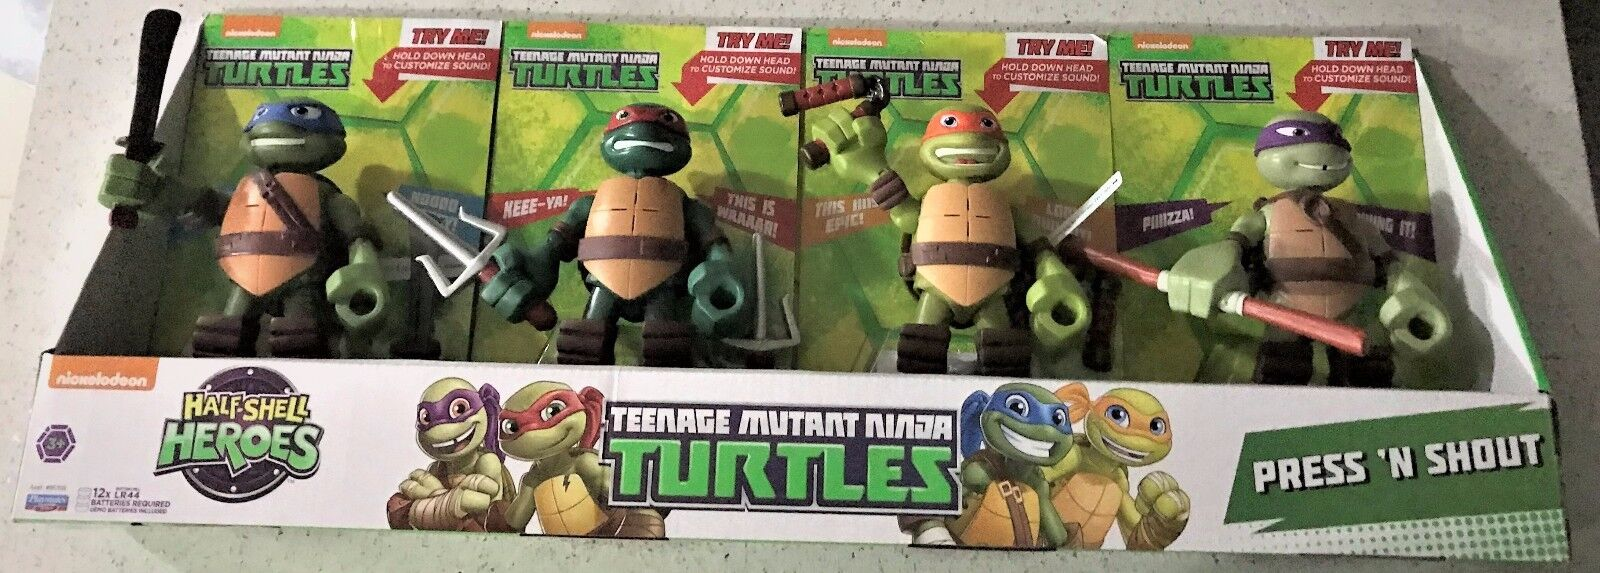 Teenage Mutant Ninja Turtles Press N Shout Ages 3+ New Toy Half Shell Heroes Fun